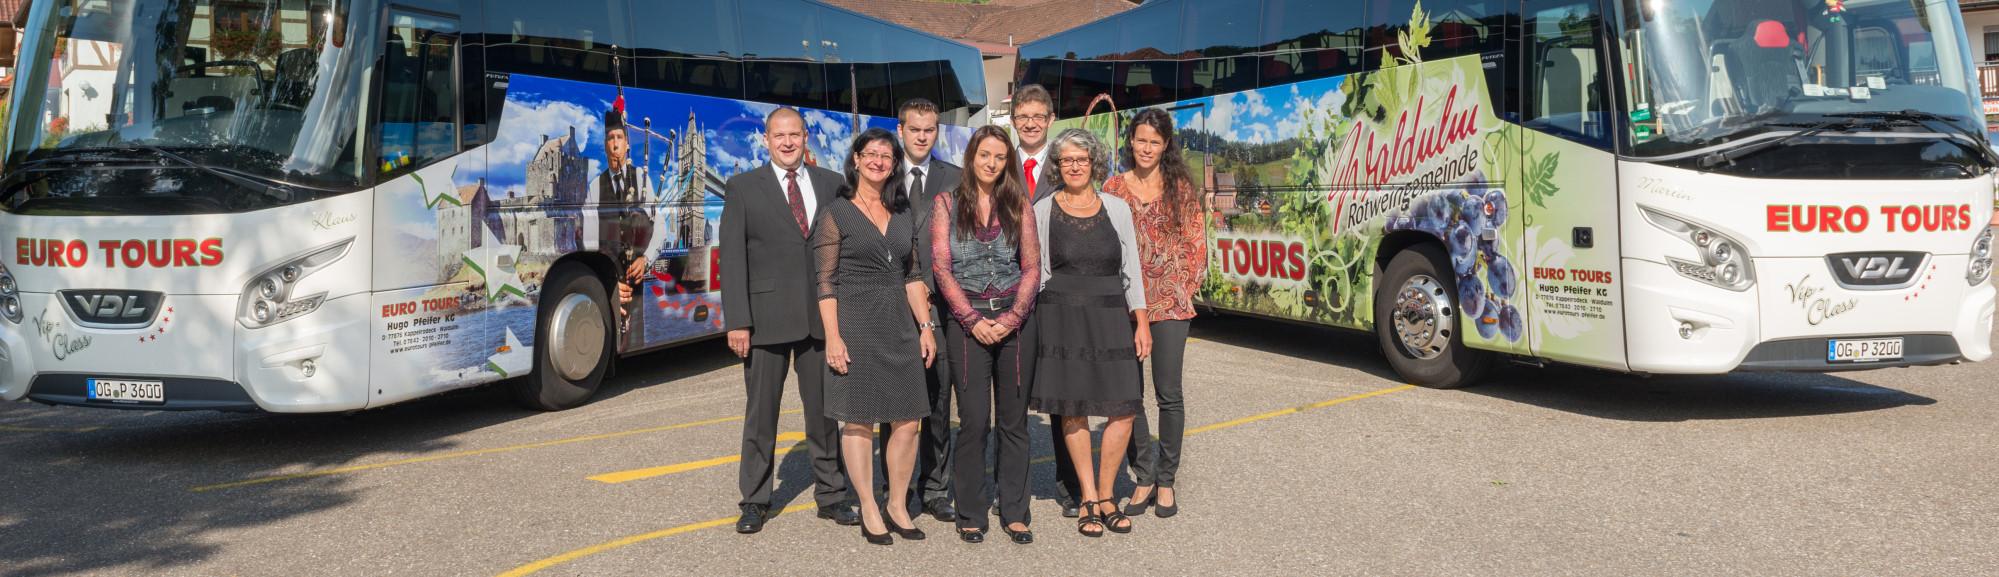 Das Team von Eurotours Pfeifer